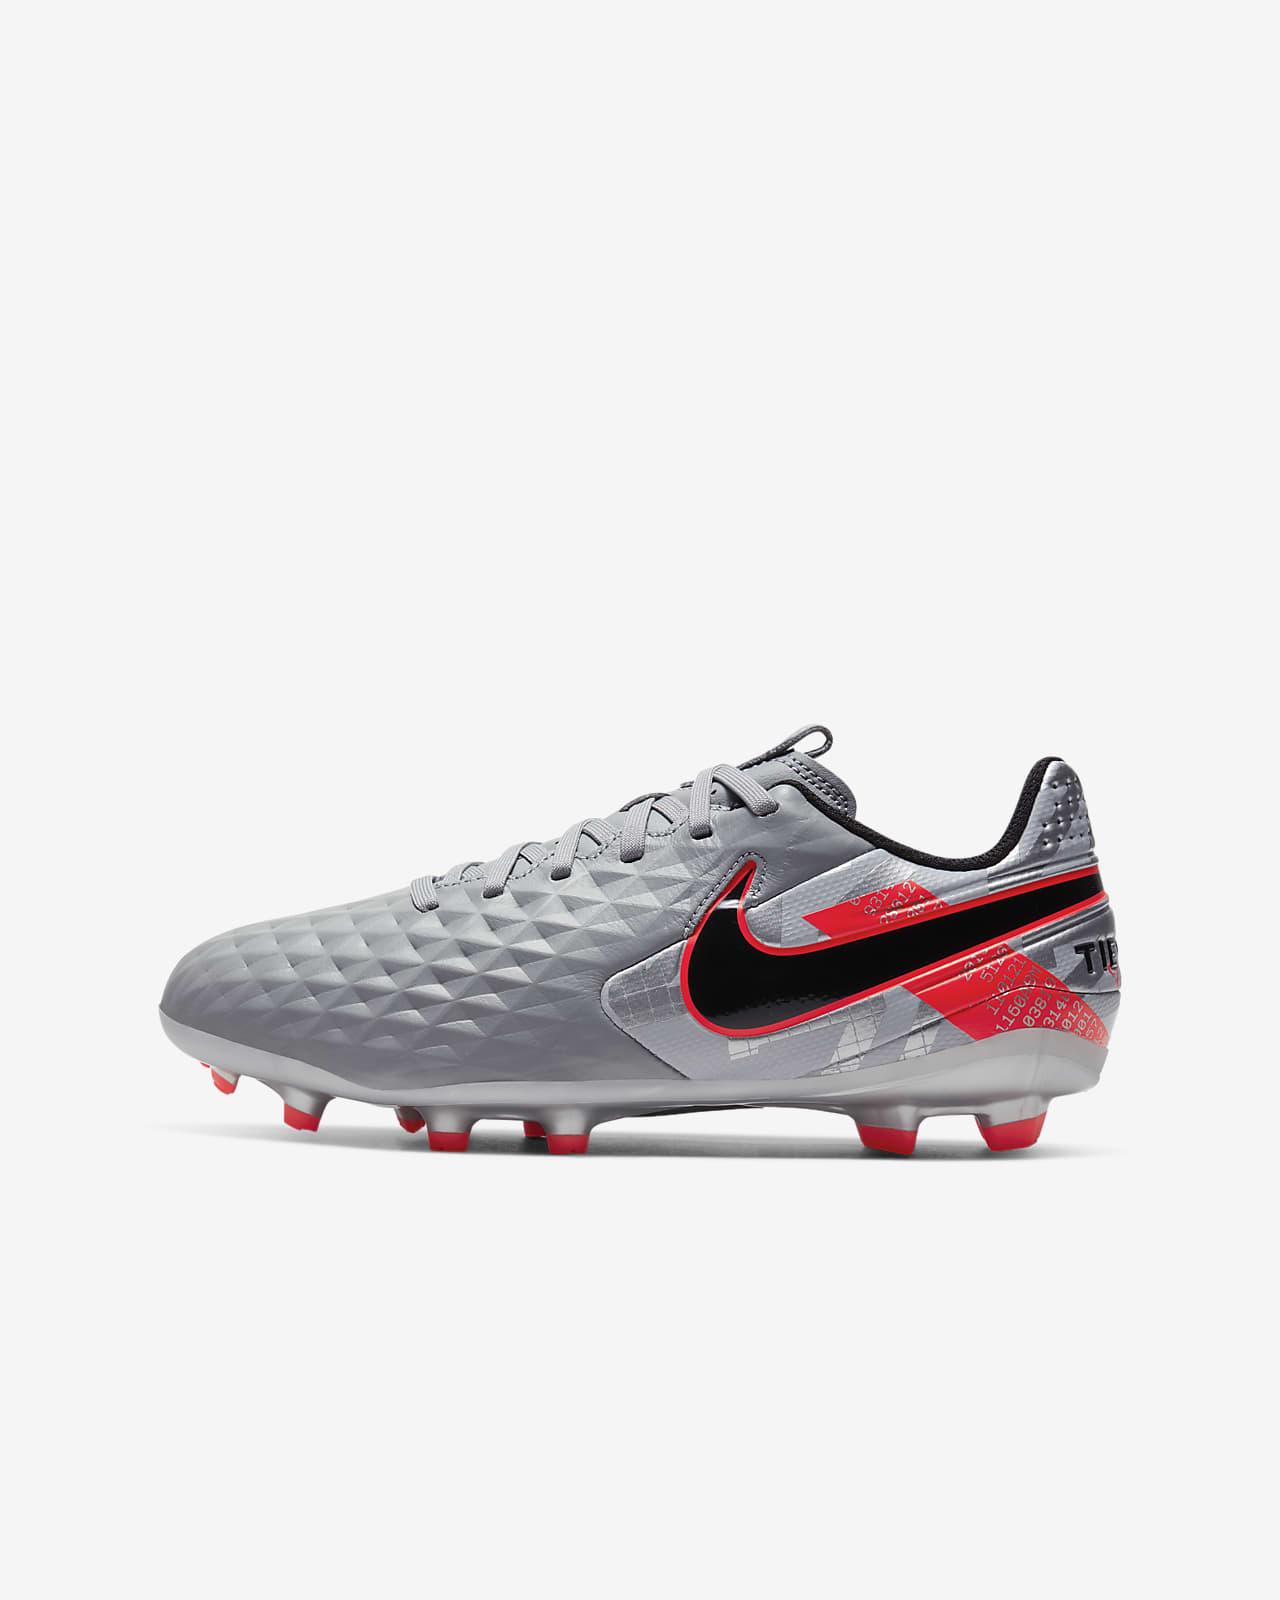 restante Dar permiso Pasado  Nike Jr. Tiempo Legend 8 Academy MG Younger/Older Kids' Multi-Ground  Football Boot. Nike LU